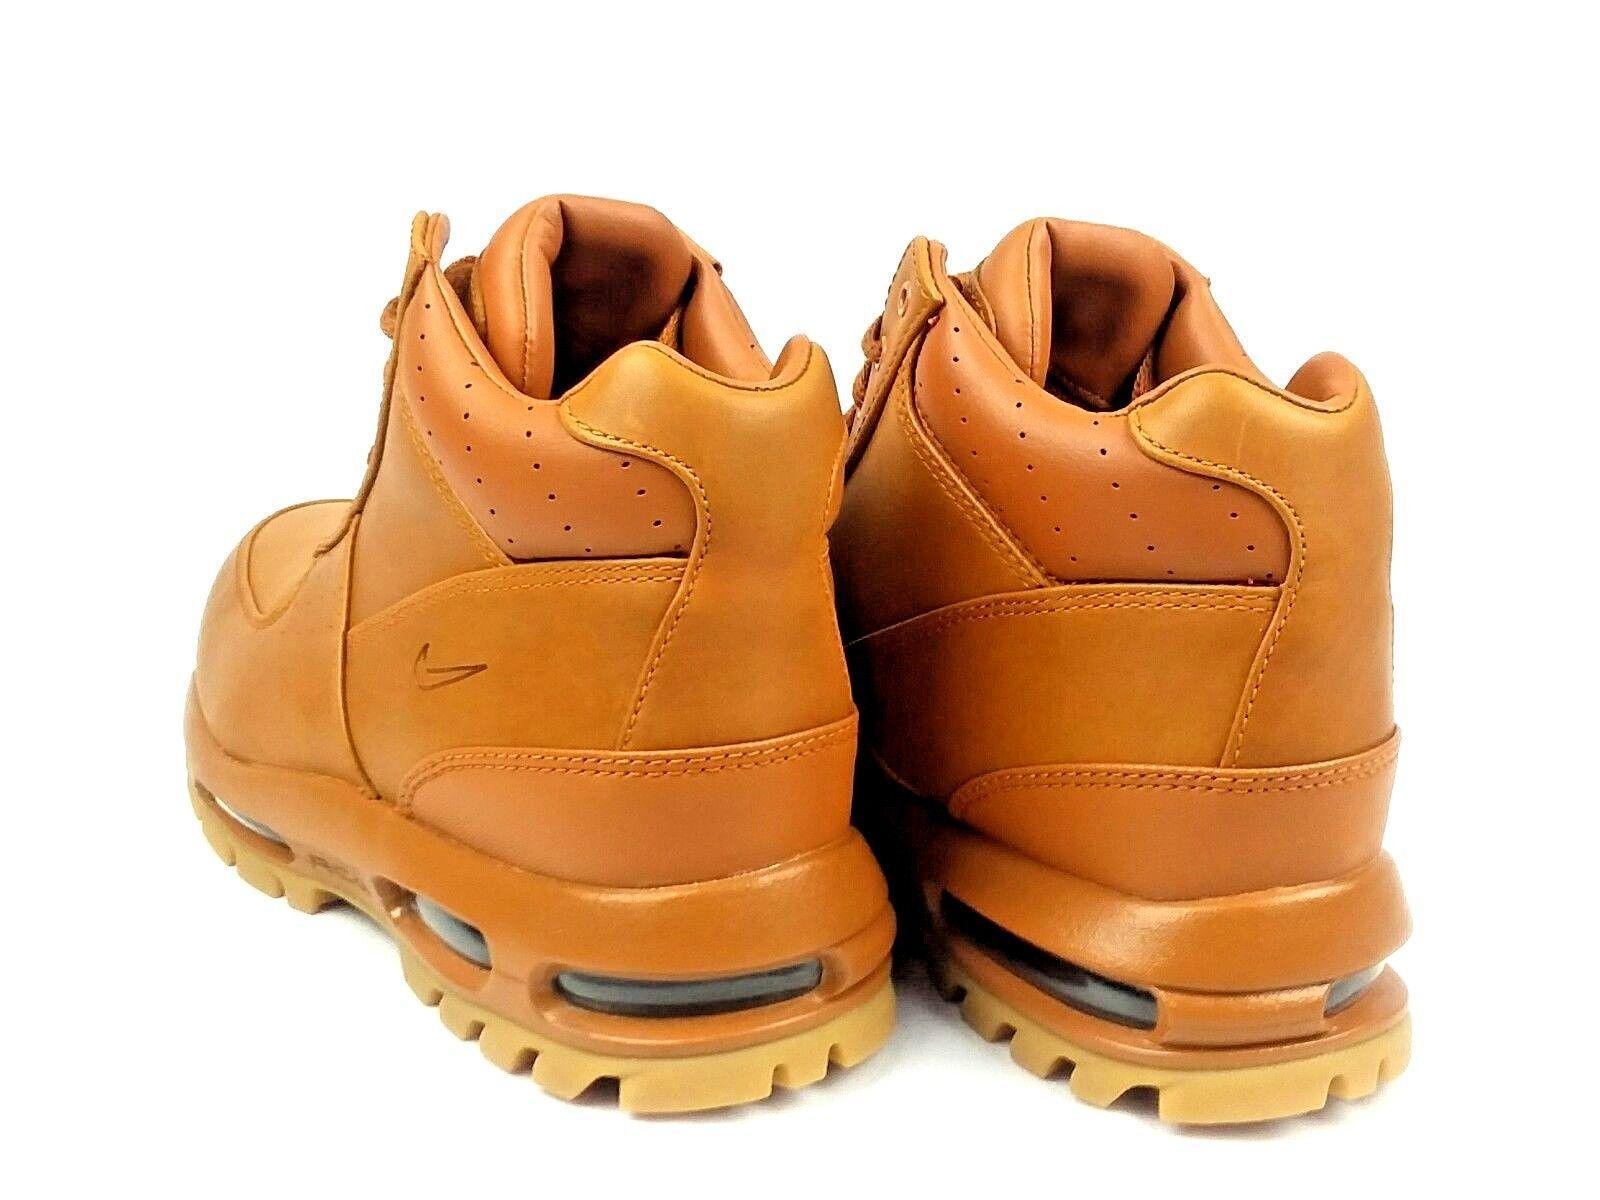 8891a84e7b Nike Air Max Goadome Boots Tawny/Gum Light Brown ACG 865031 208 Mens Size  7.5